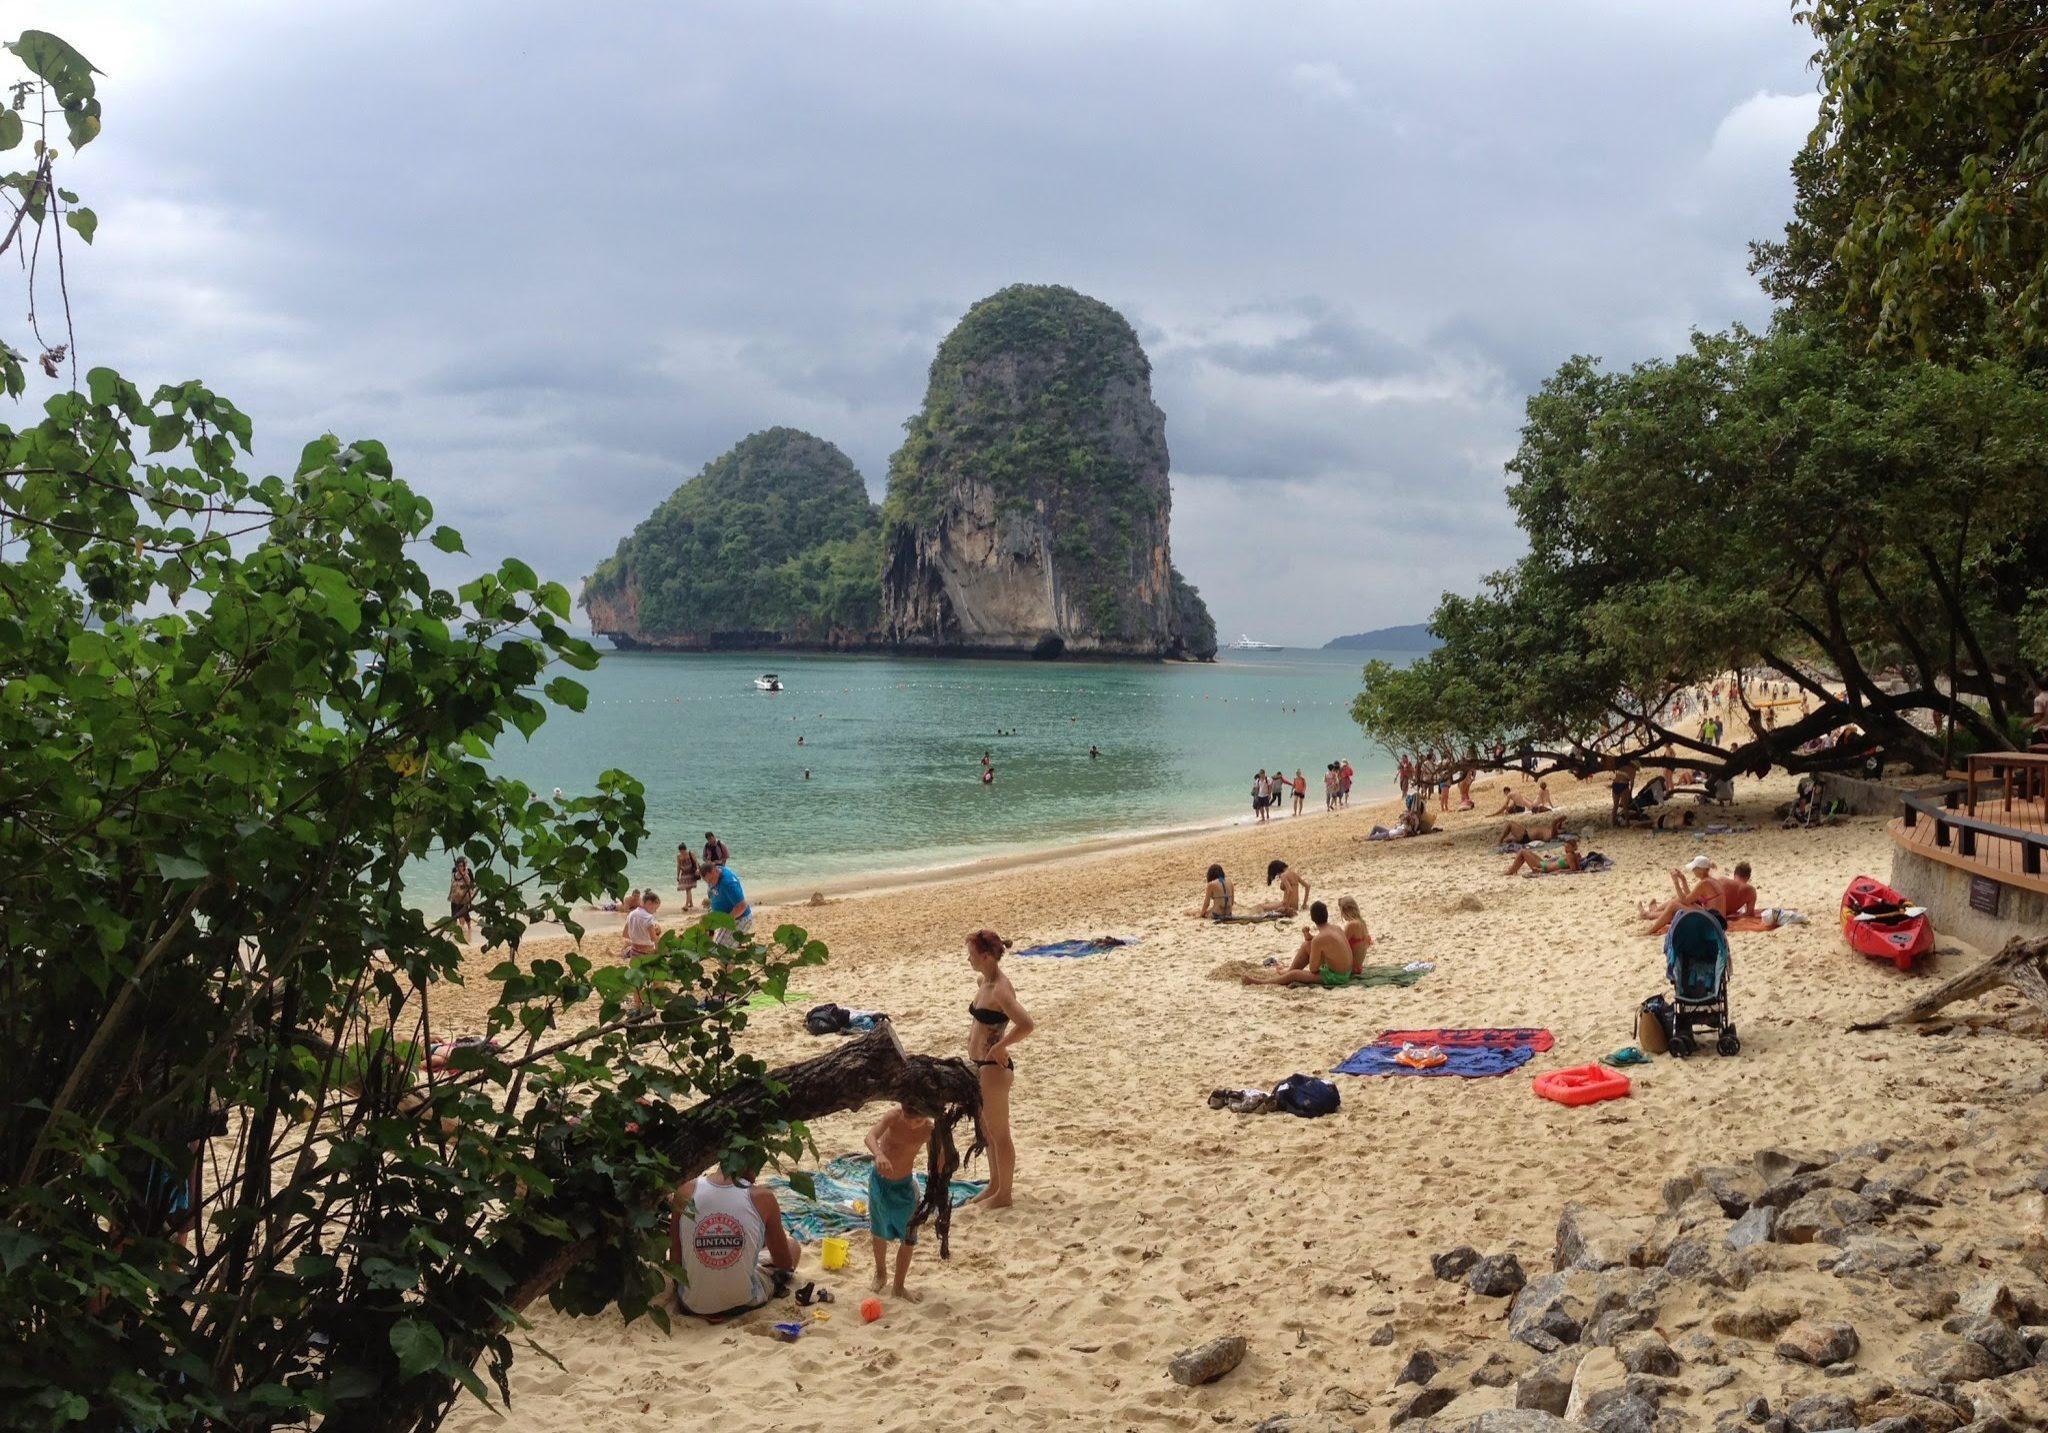 Railey beach, krabi, thailand, travels, travelling, beach, backpacking,